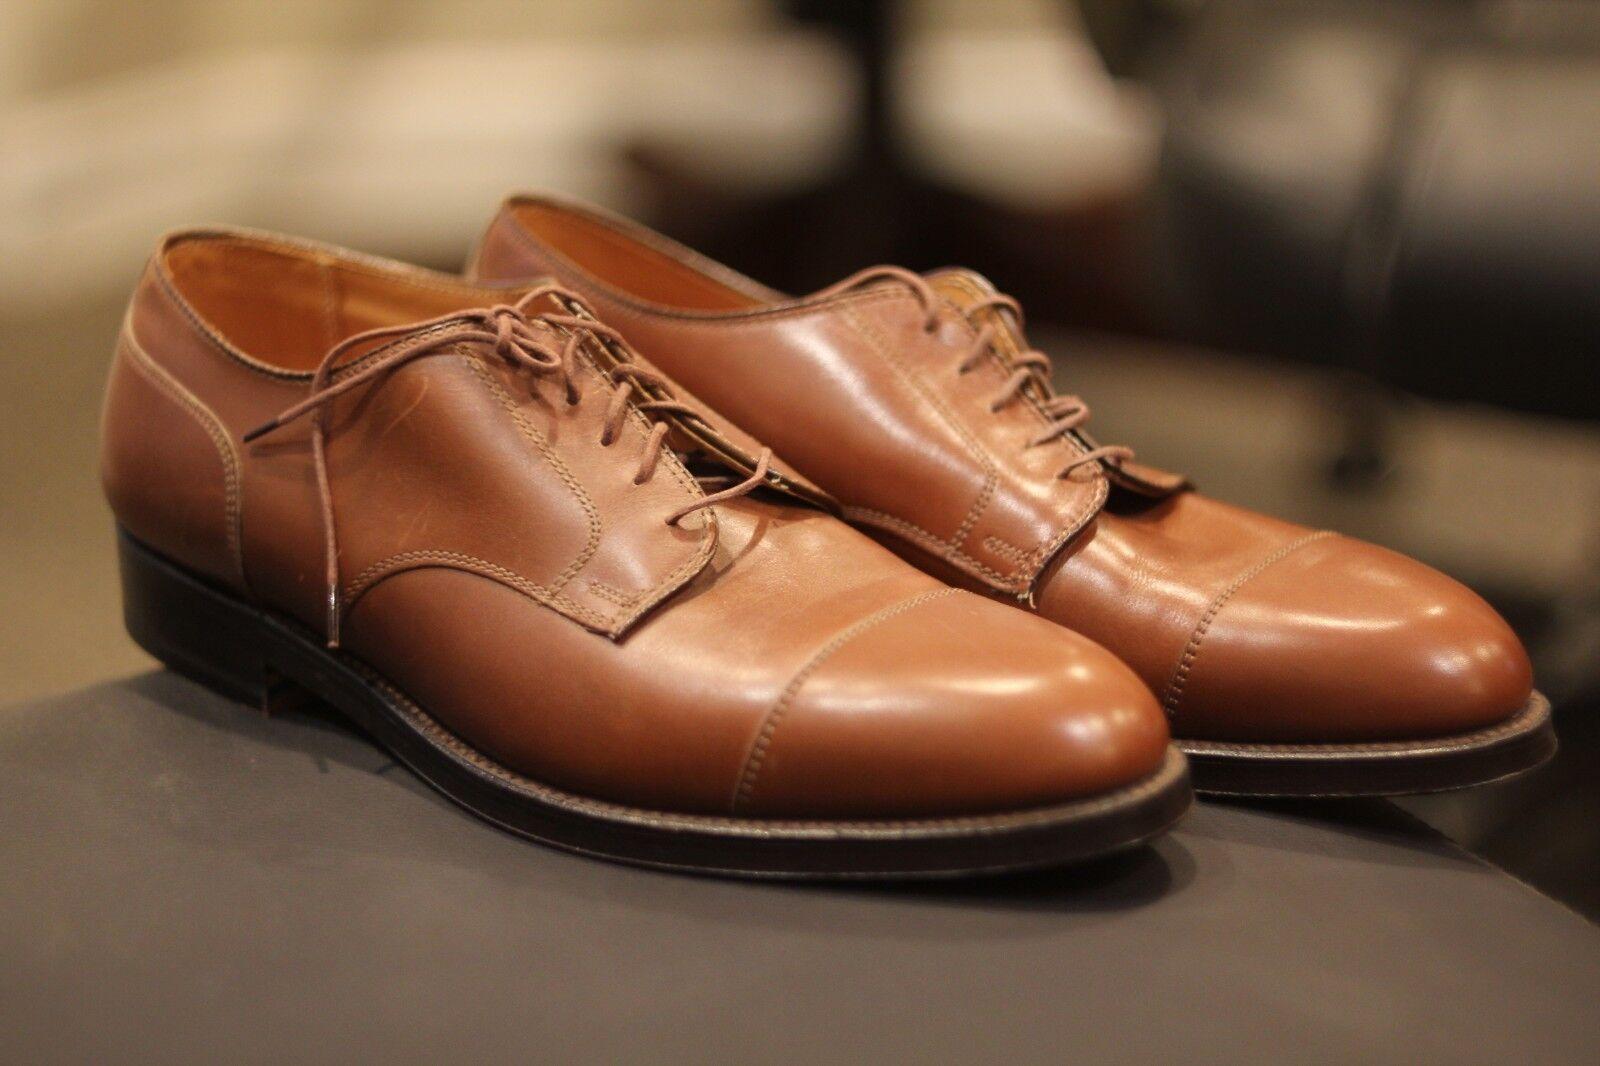 Alden 972 Homme marron Straight Tip Blücher Derby Veau Chaussures en Cuir SZ 10 C